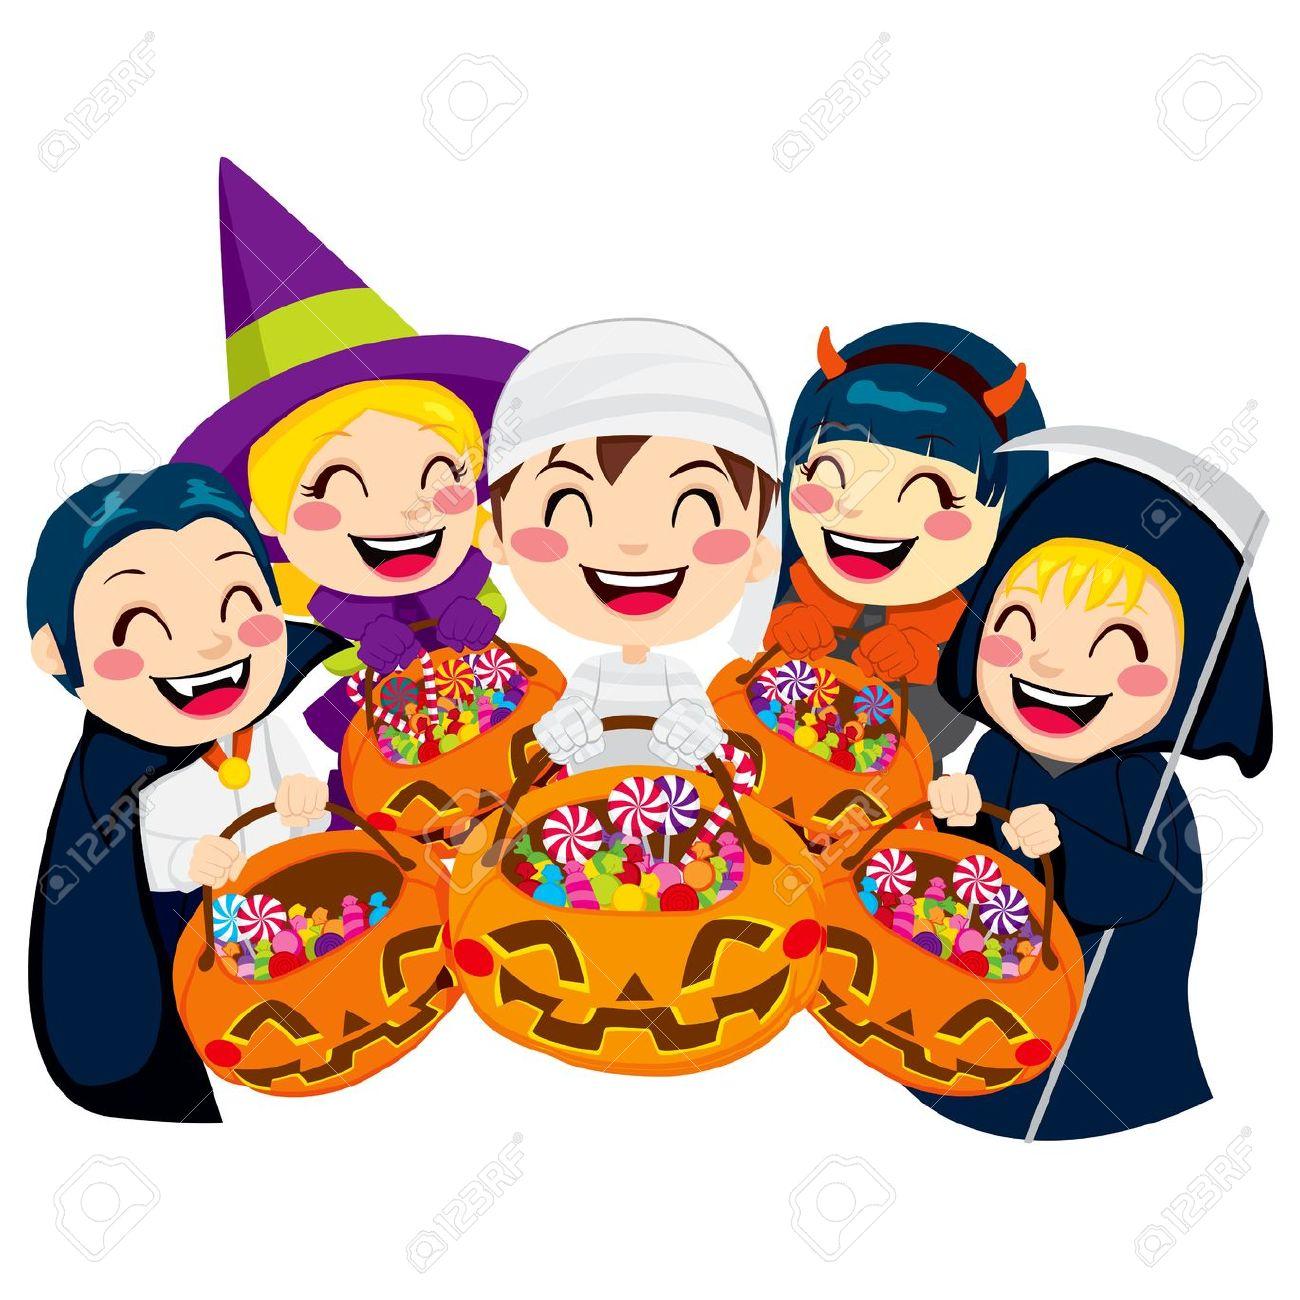 Disney Halloween Clip Art Images   Holidays at Disney Clip Art Galore    Halloween clips, Mickey halloween, Disney halloween